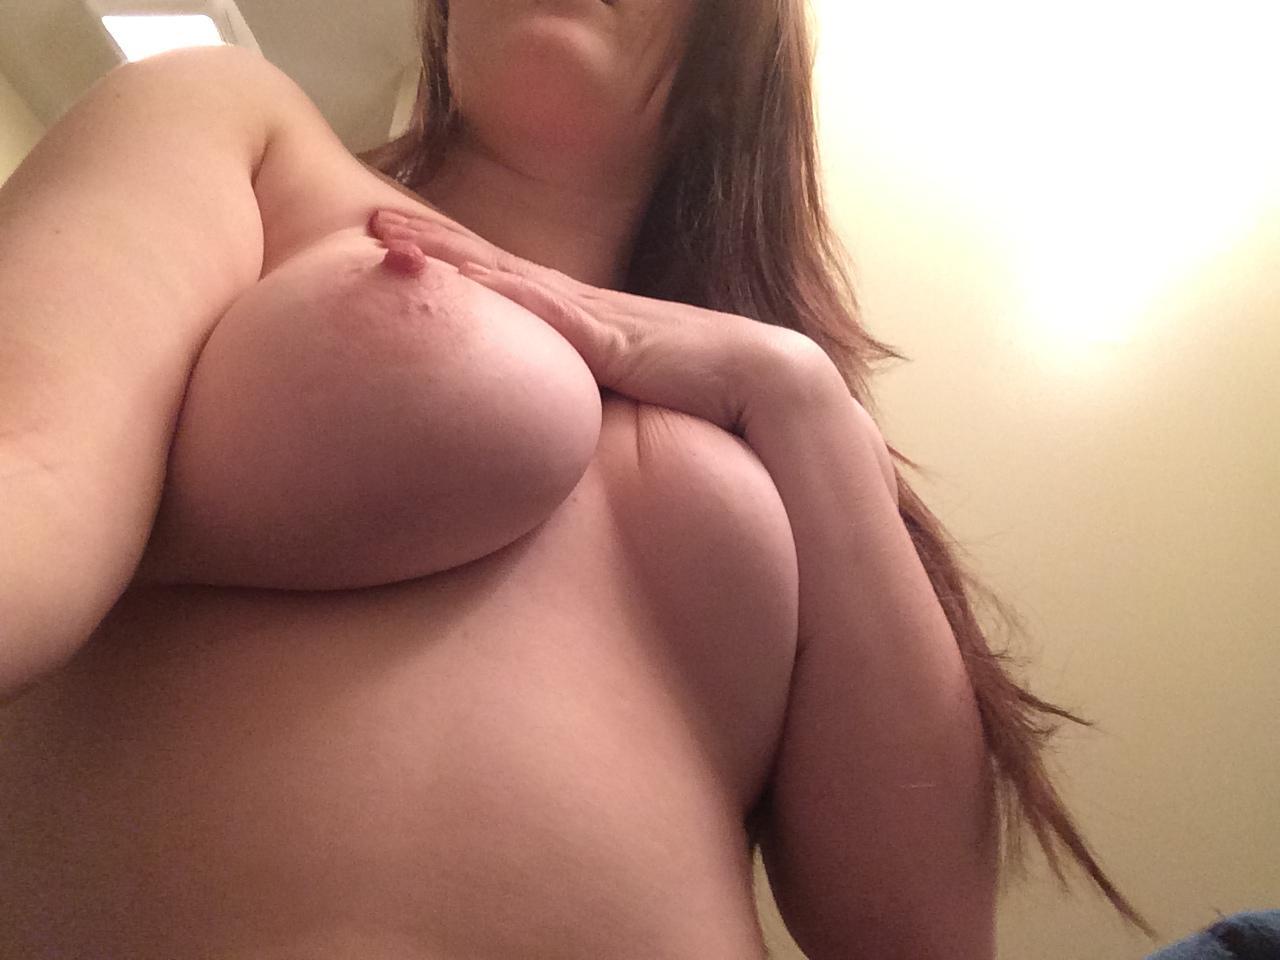 Veronica zermanova sex video stairs